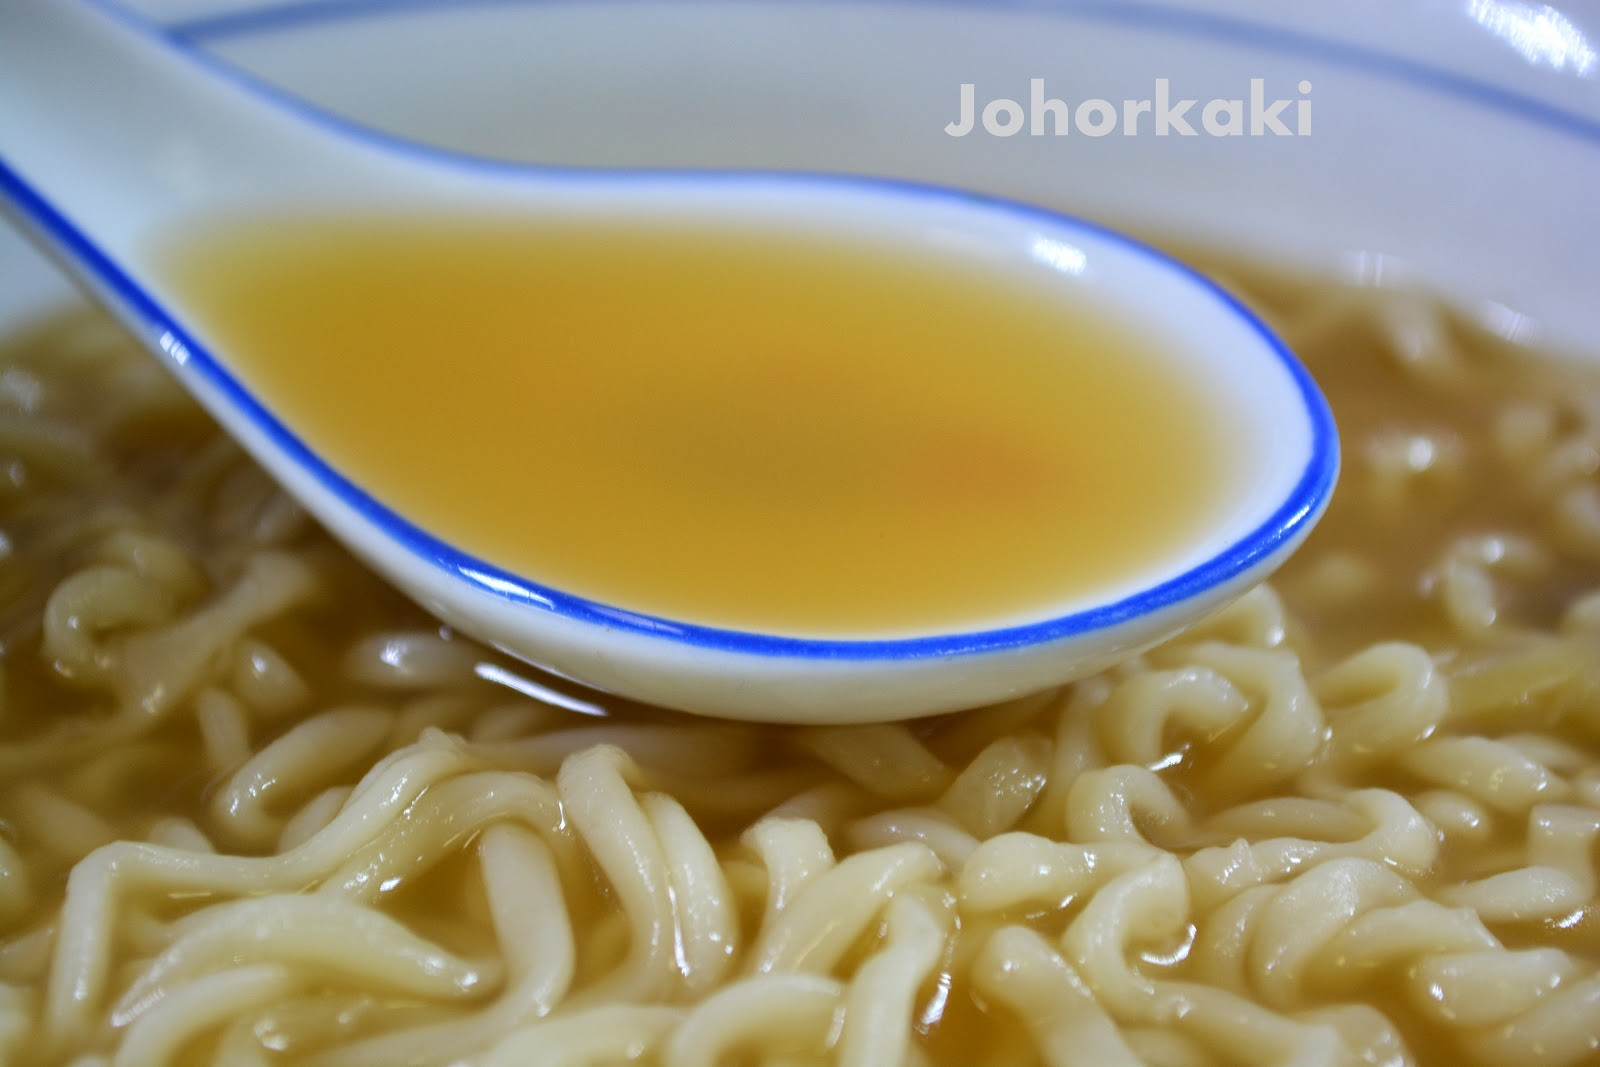 Samyang Japanese Style Flavour U-dong Instant Noodle Soup |FiND DiNiNG ...